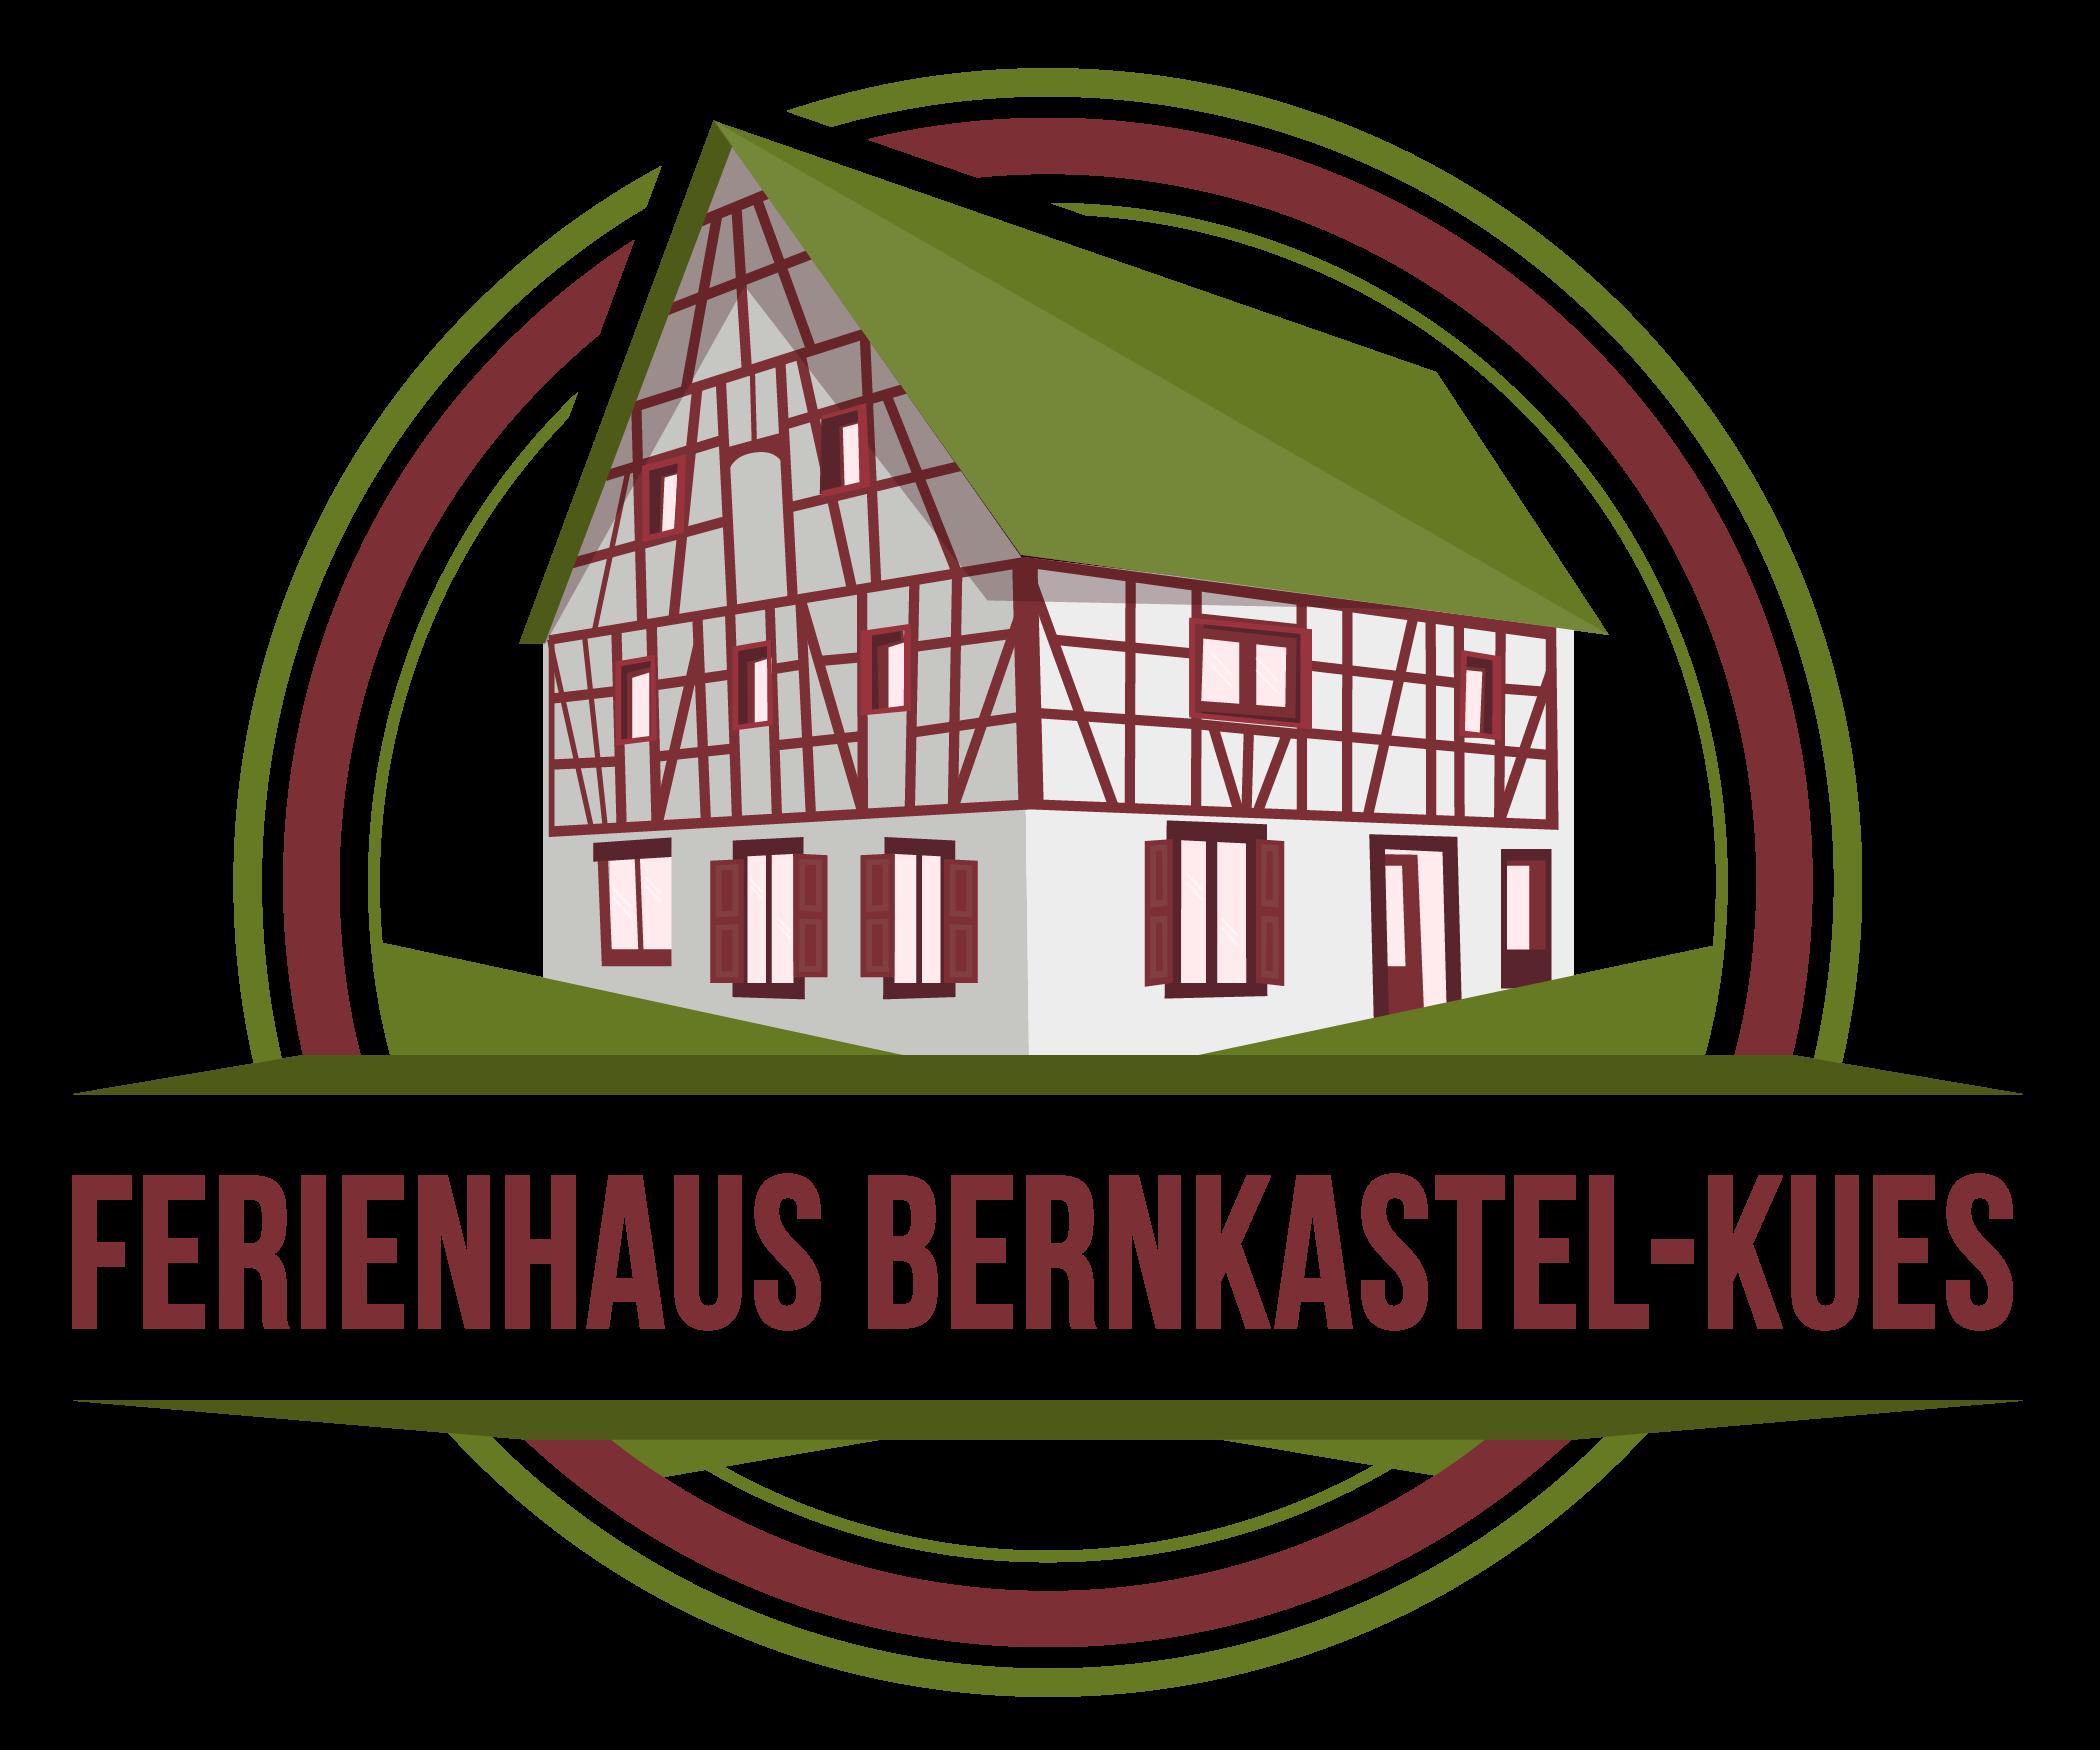 Ferienhaus Bernkastel-Kues